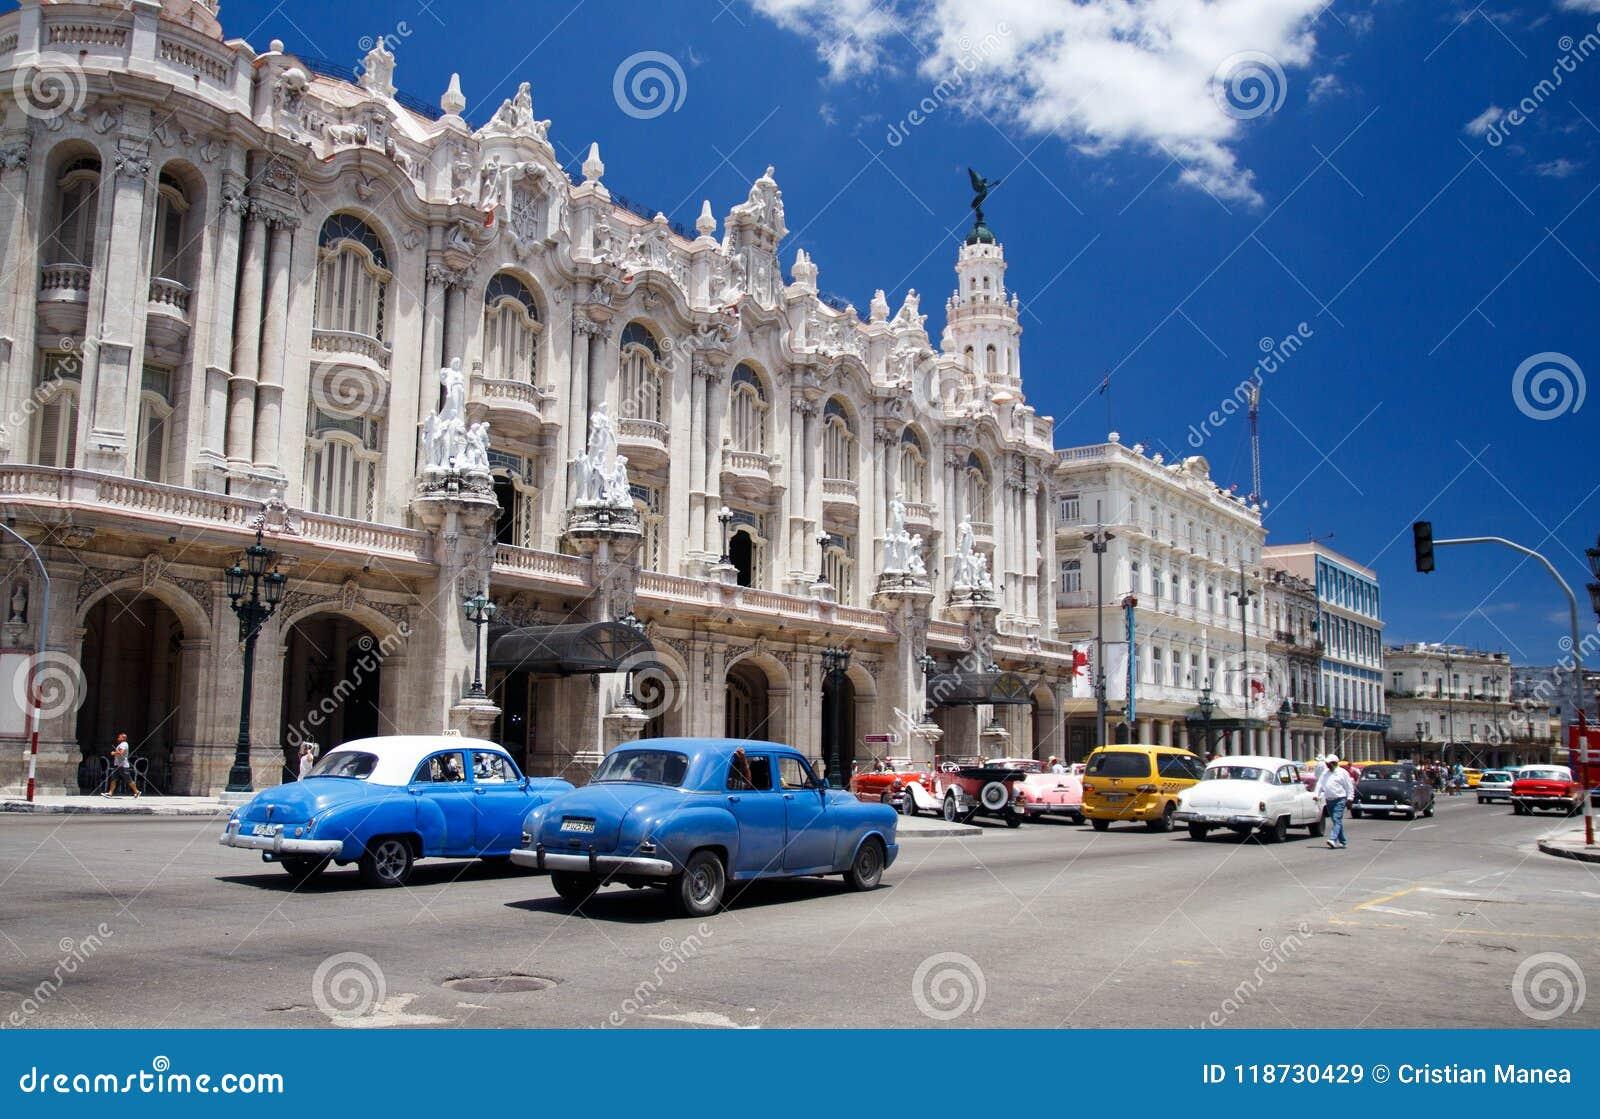 Oude retro klassieke Amerikaanse auto s in Havana, Cuba - 4